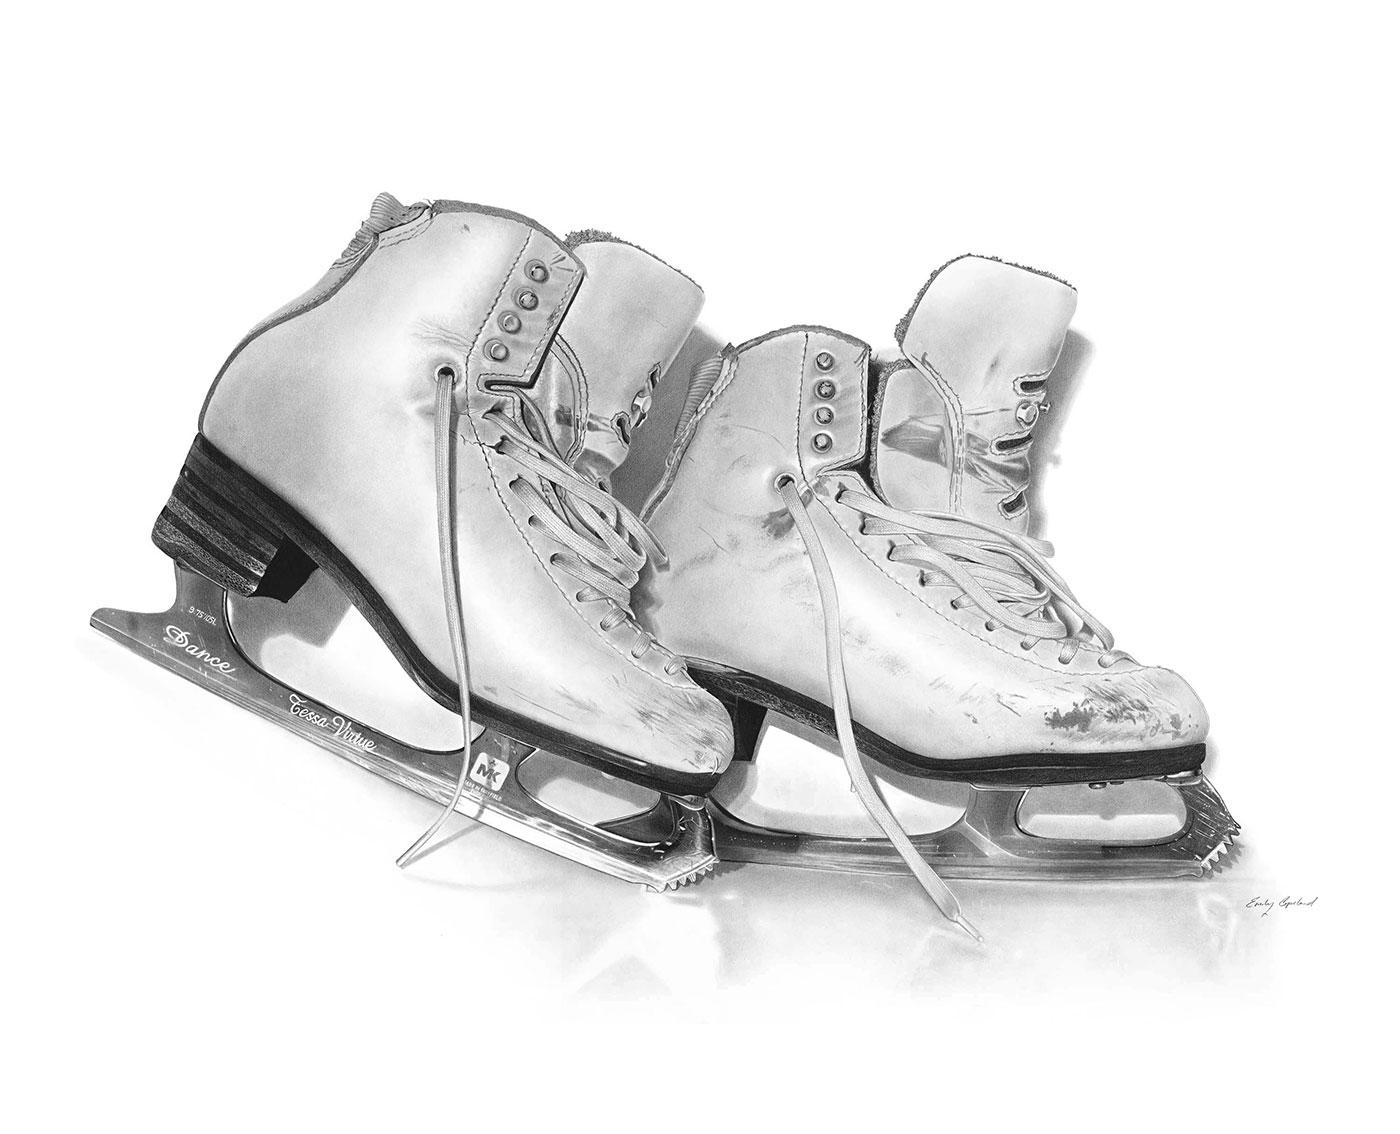 Tessa Virtue's Olympic Skates – Emily Copeland-opt